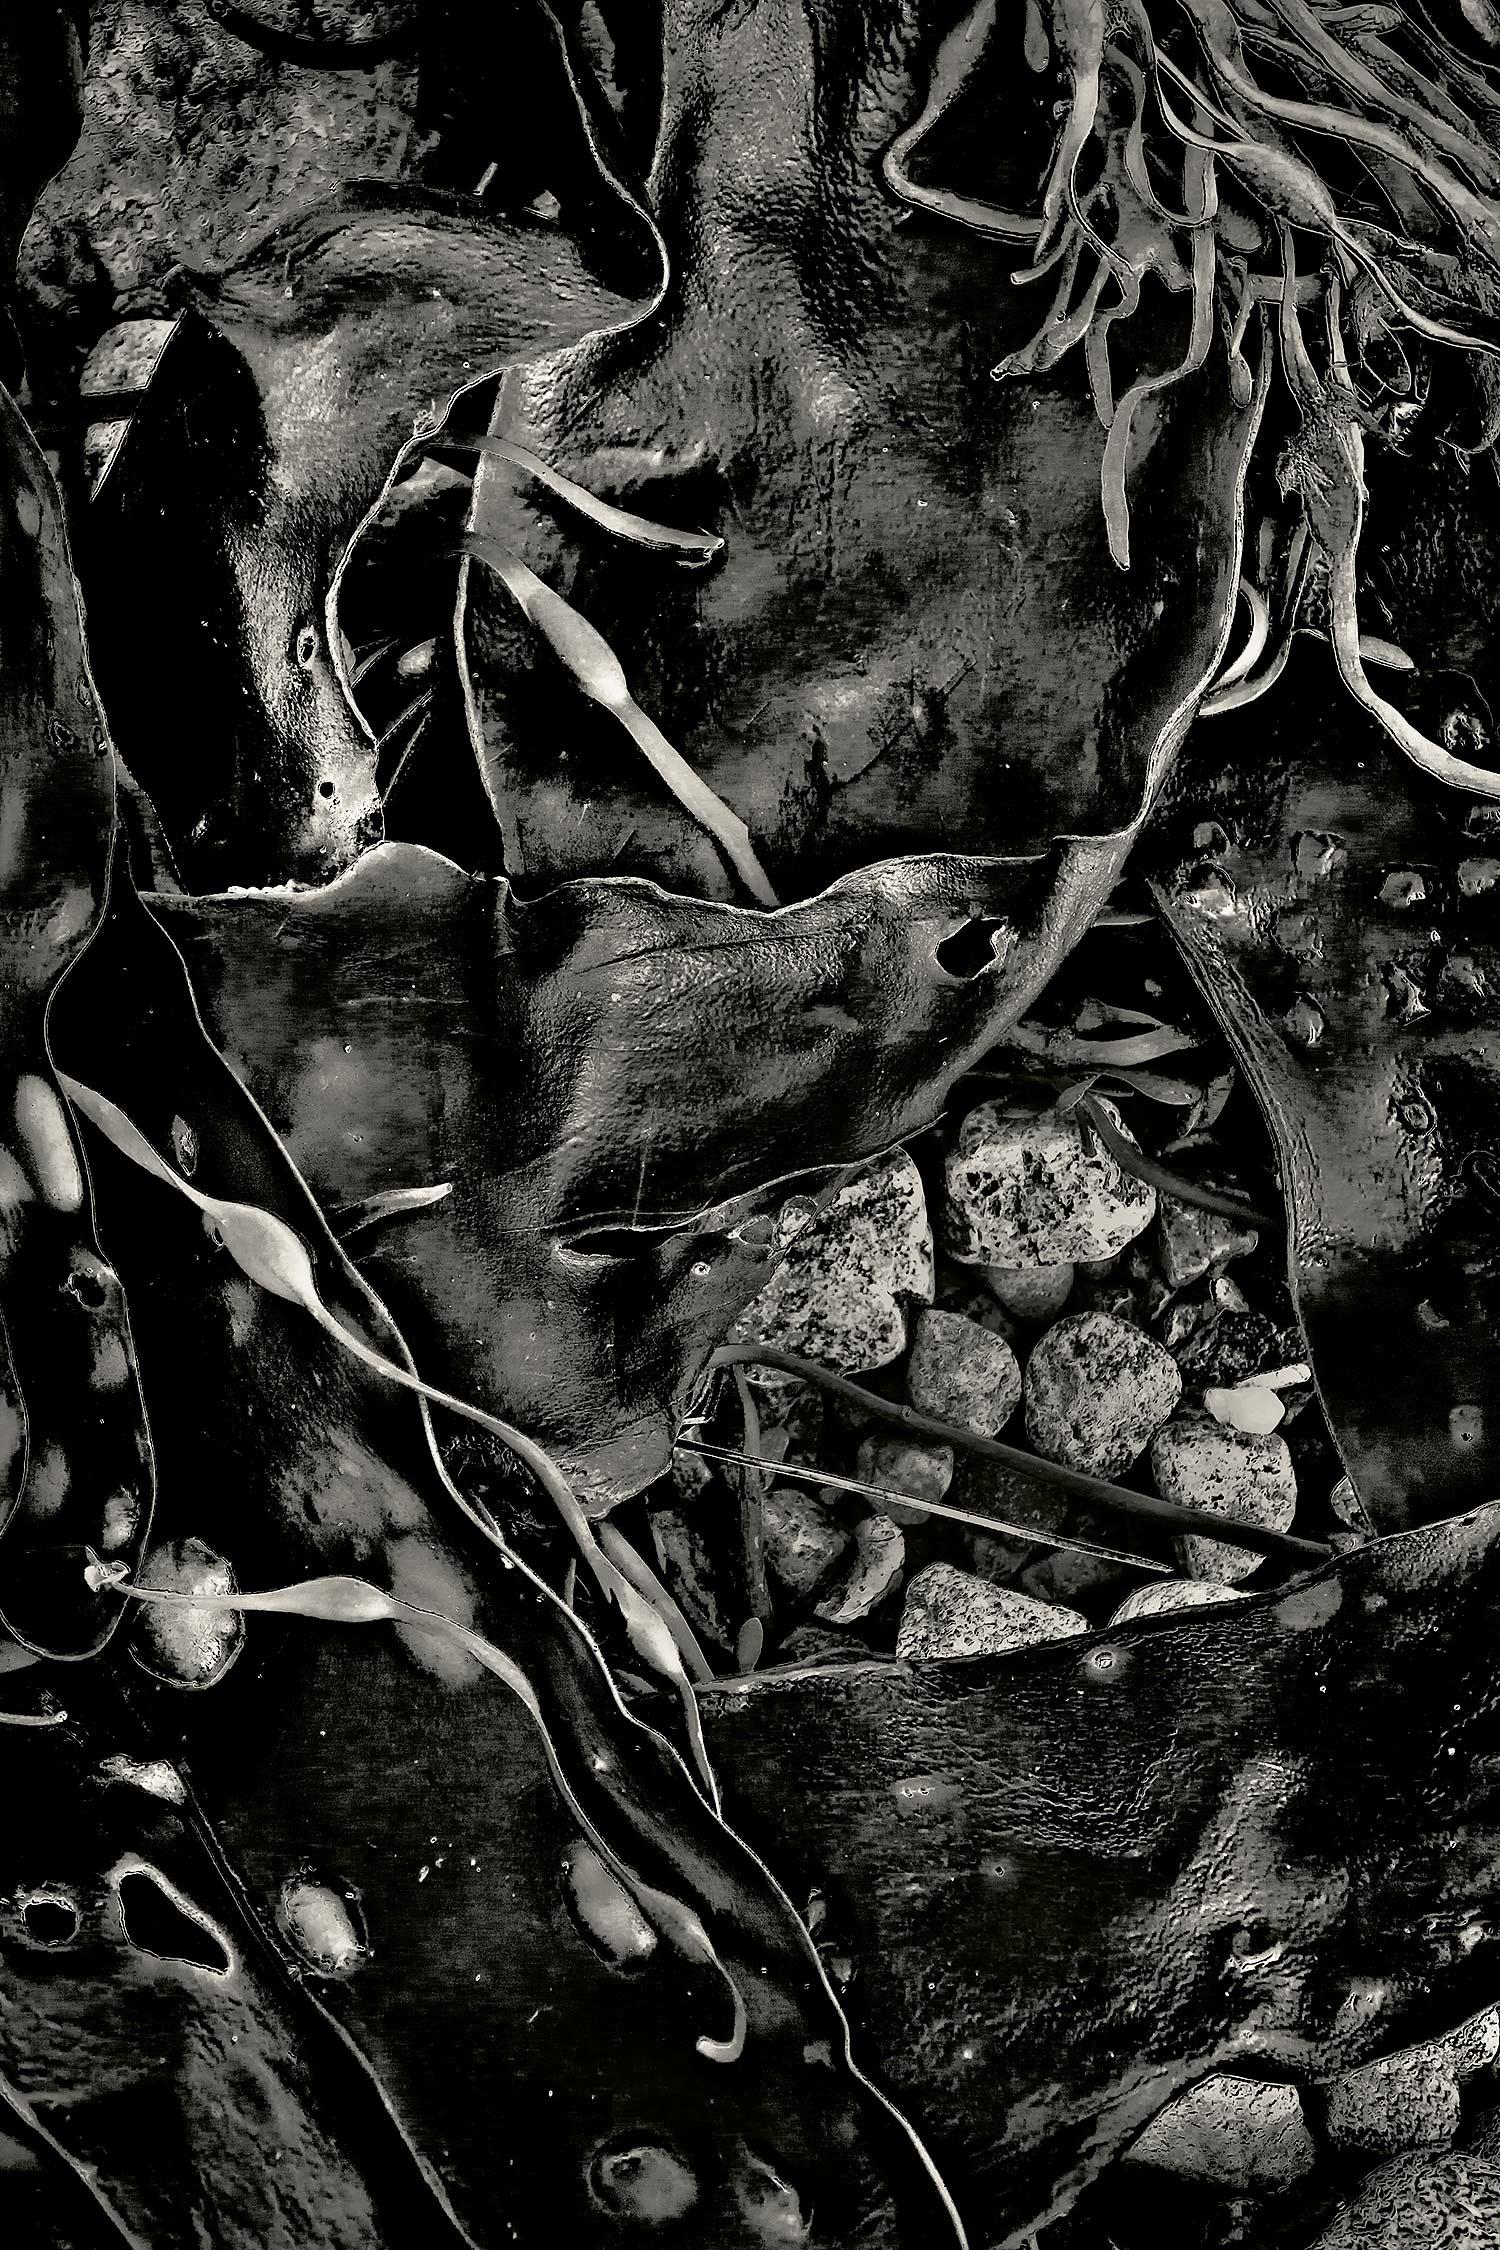 Seaweed 413, Seawall, Maine, 2011